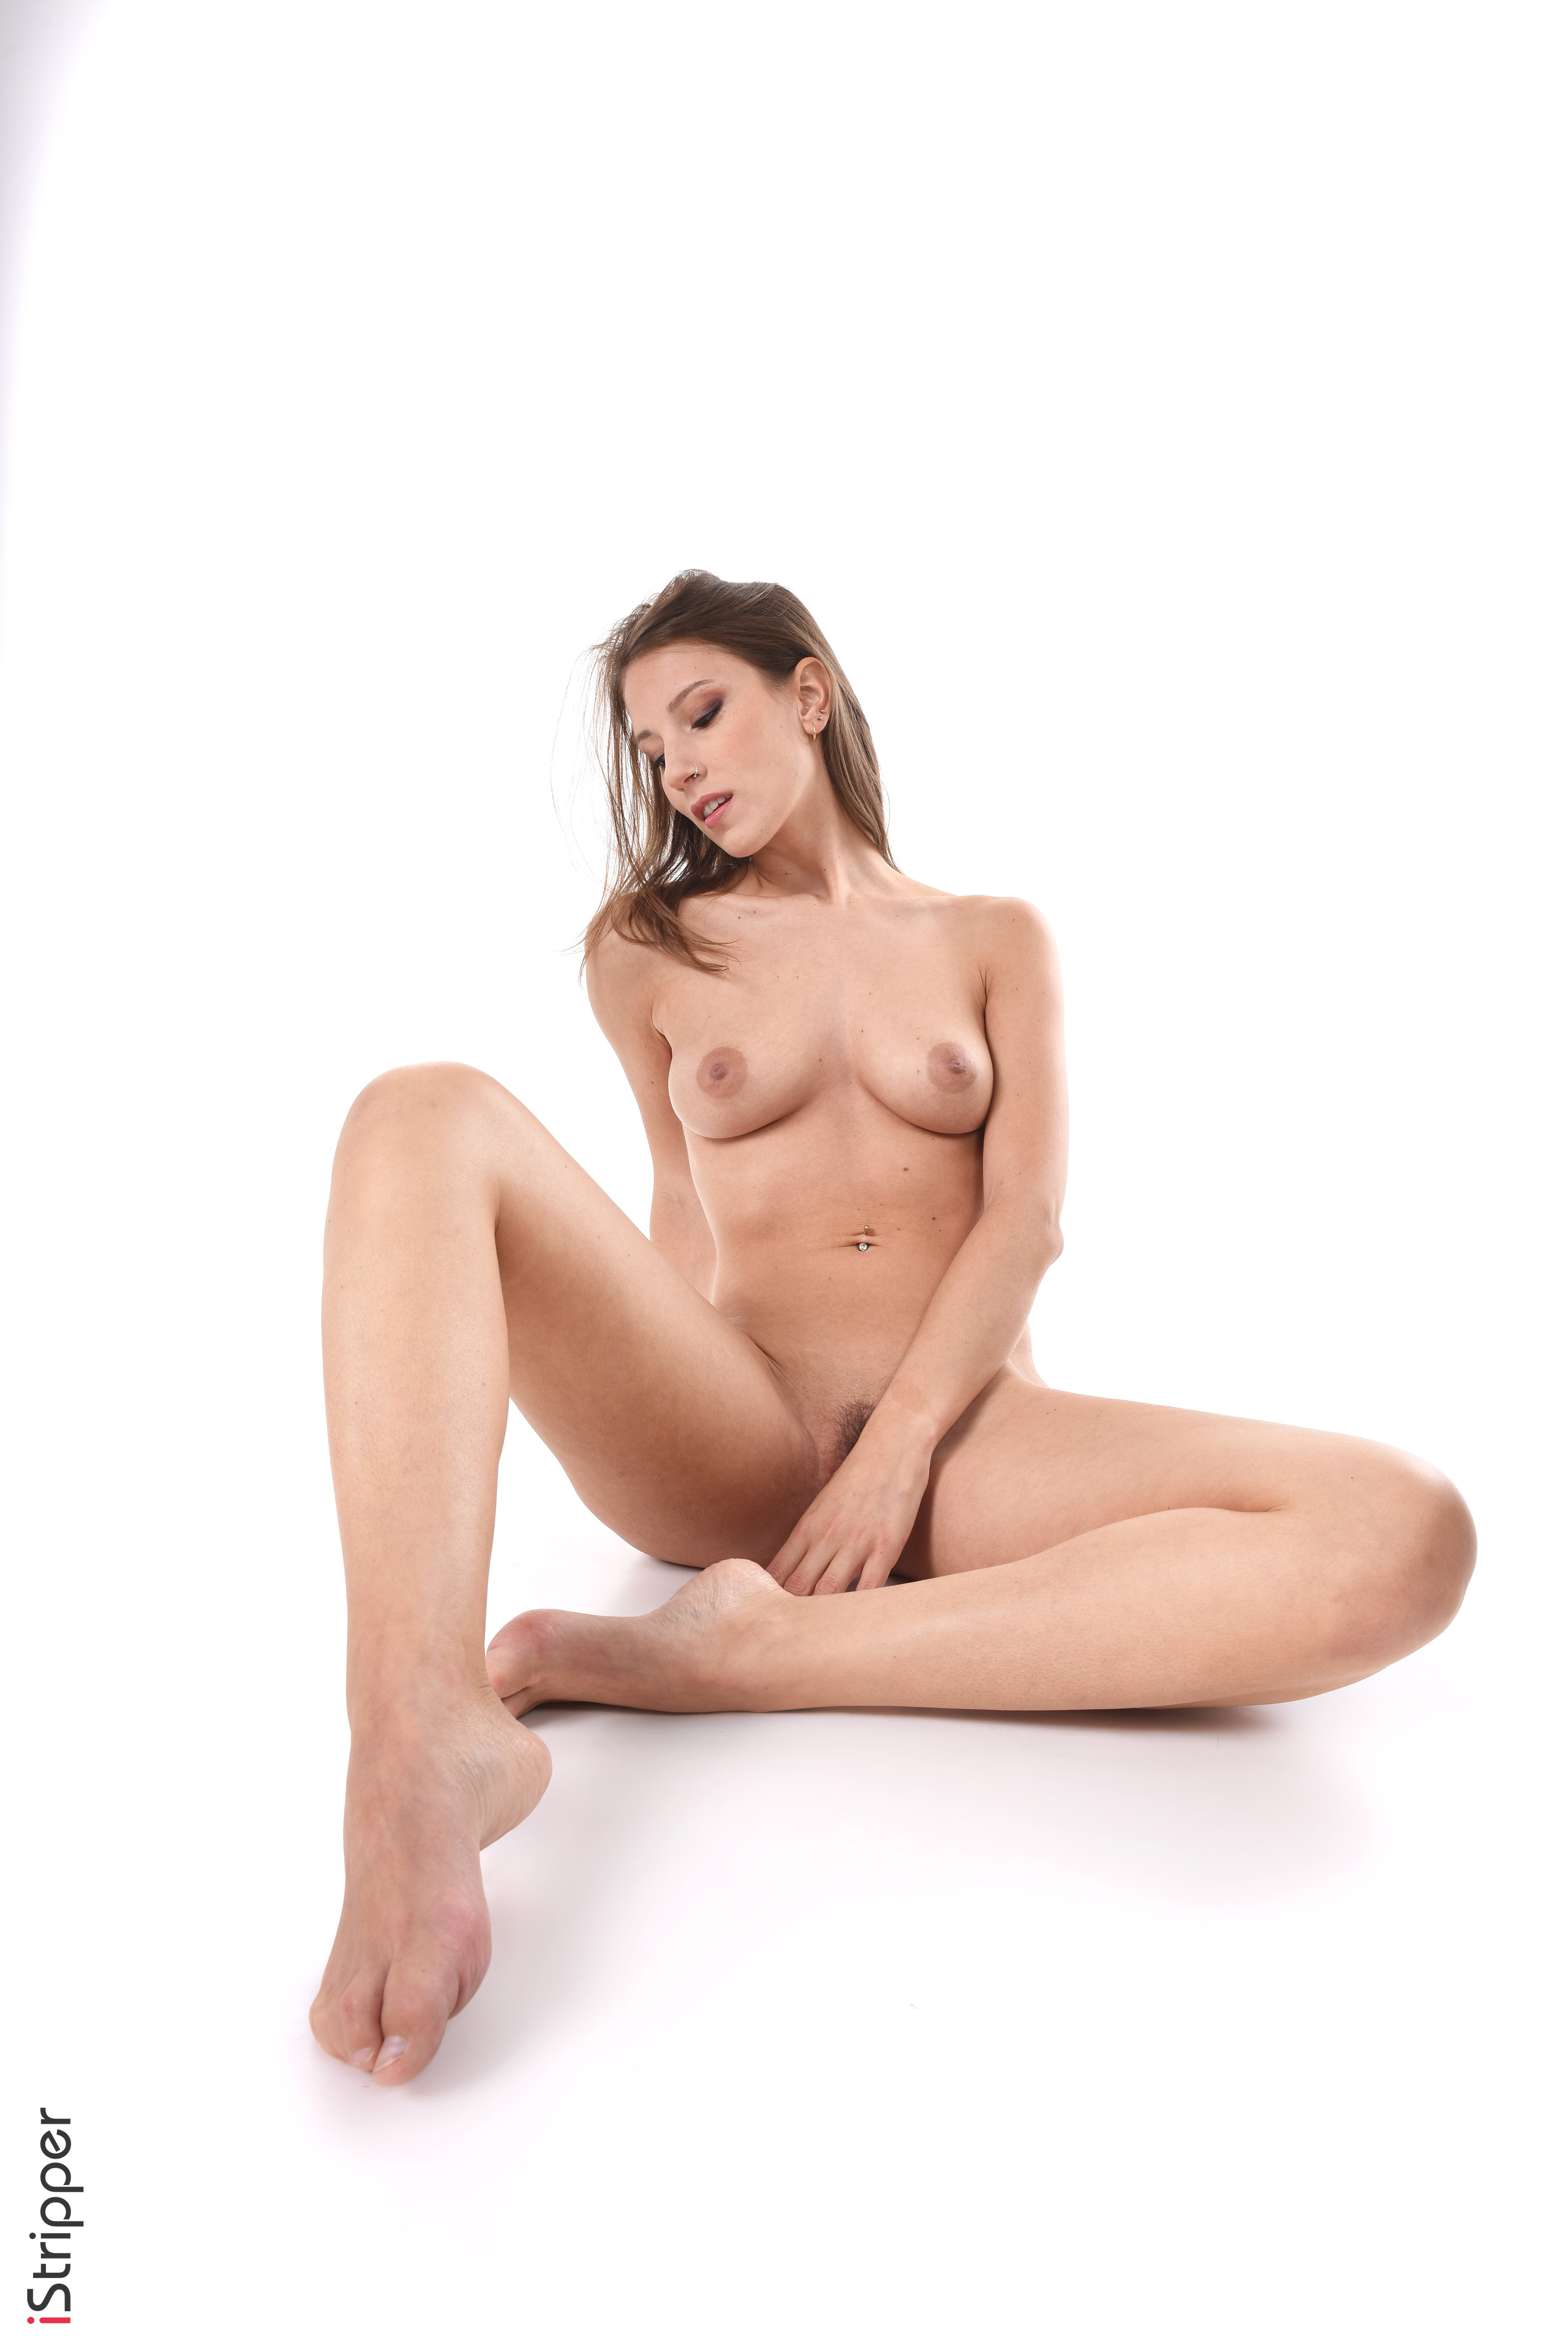 adriana lima nude wallpapers